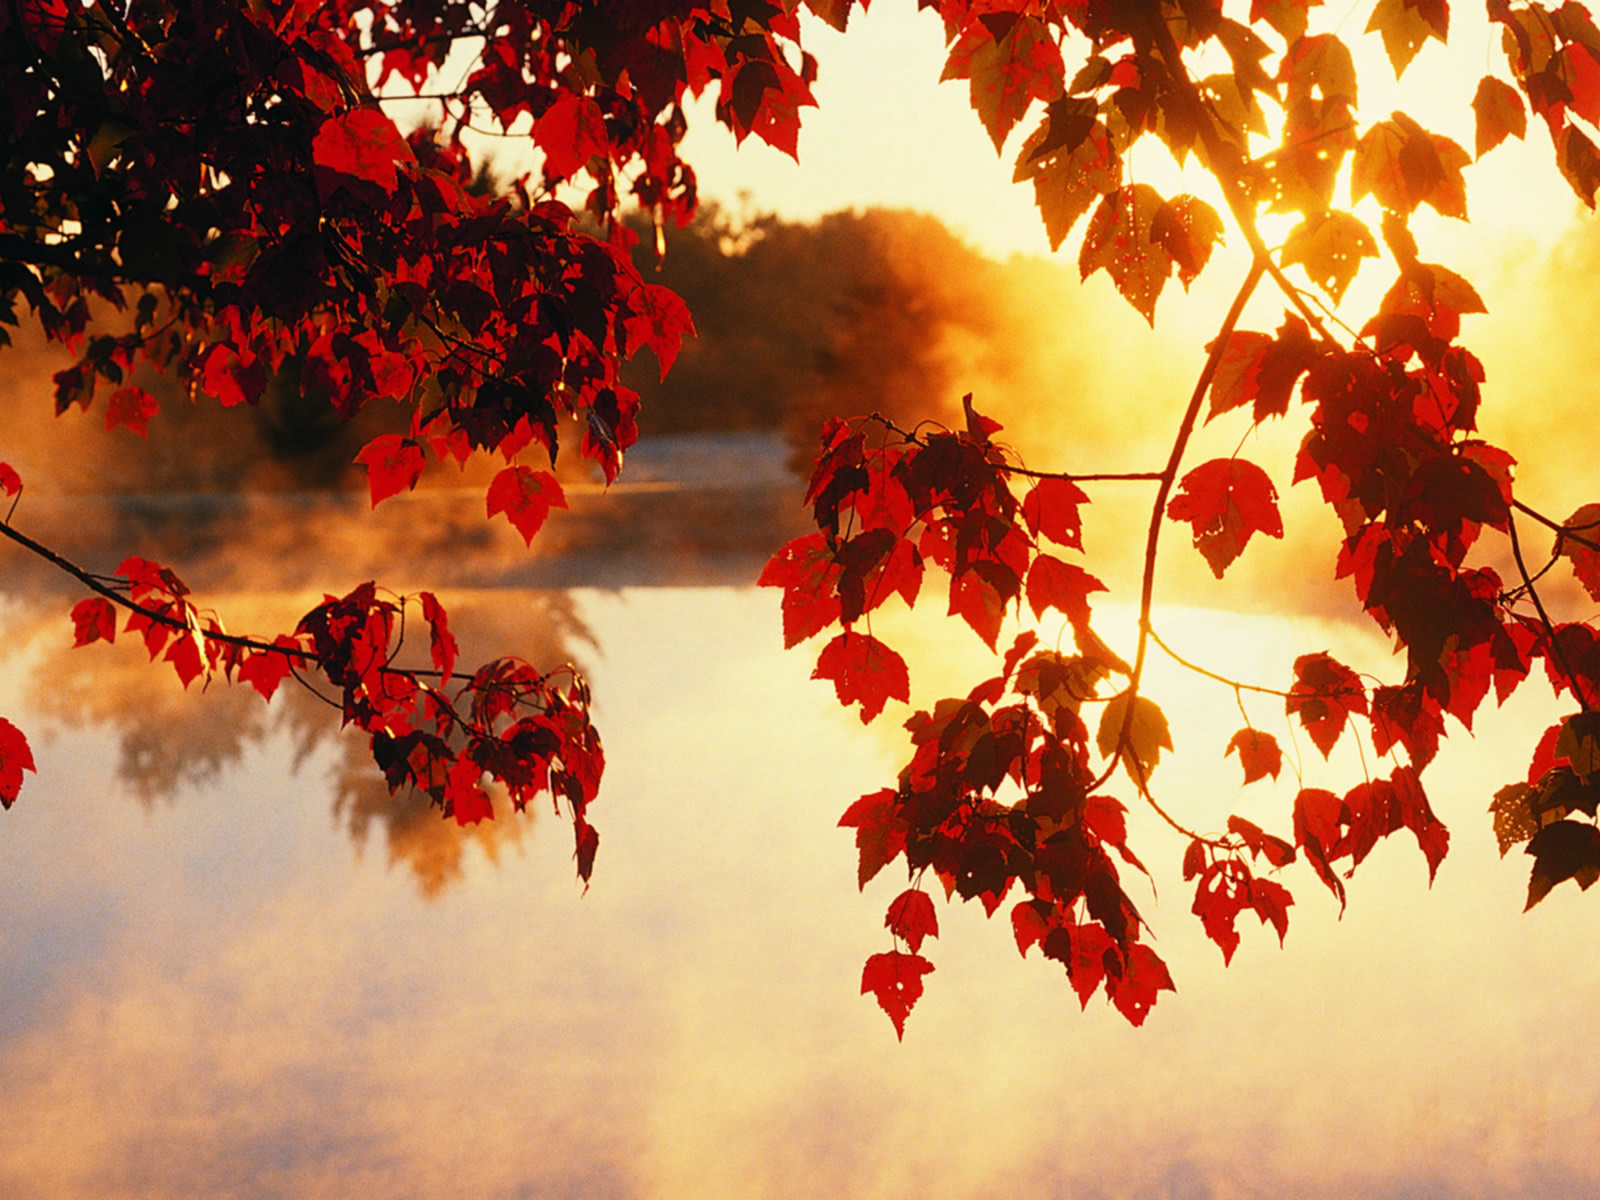 fall leaves wallpaper free Autumn